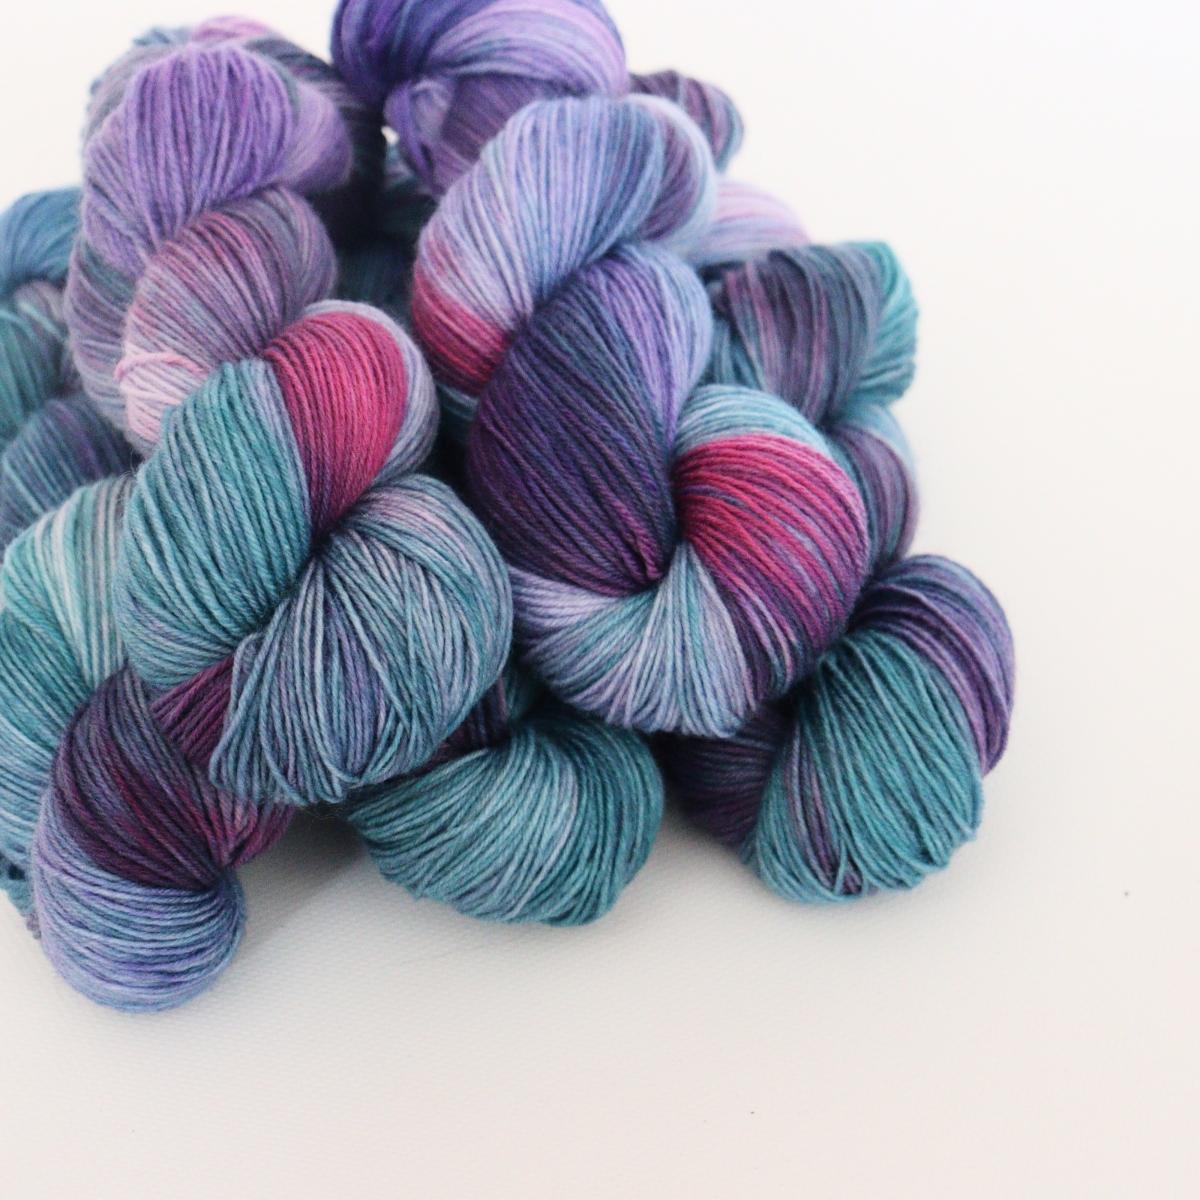 woodico.pro hand dyed yarn 064 2 1200x1200 - Hand dyed yarn / 064